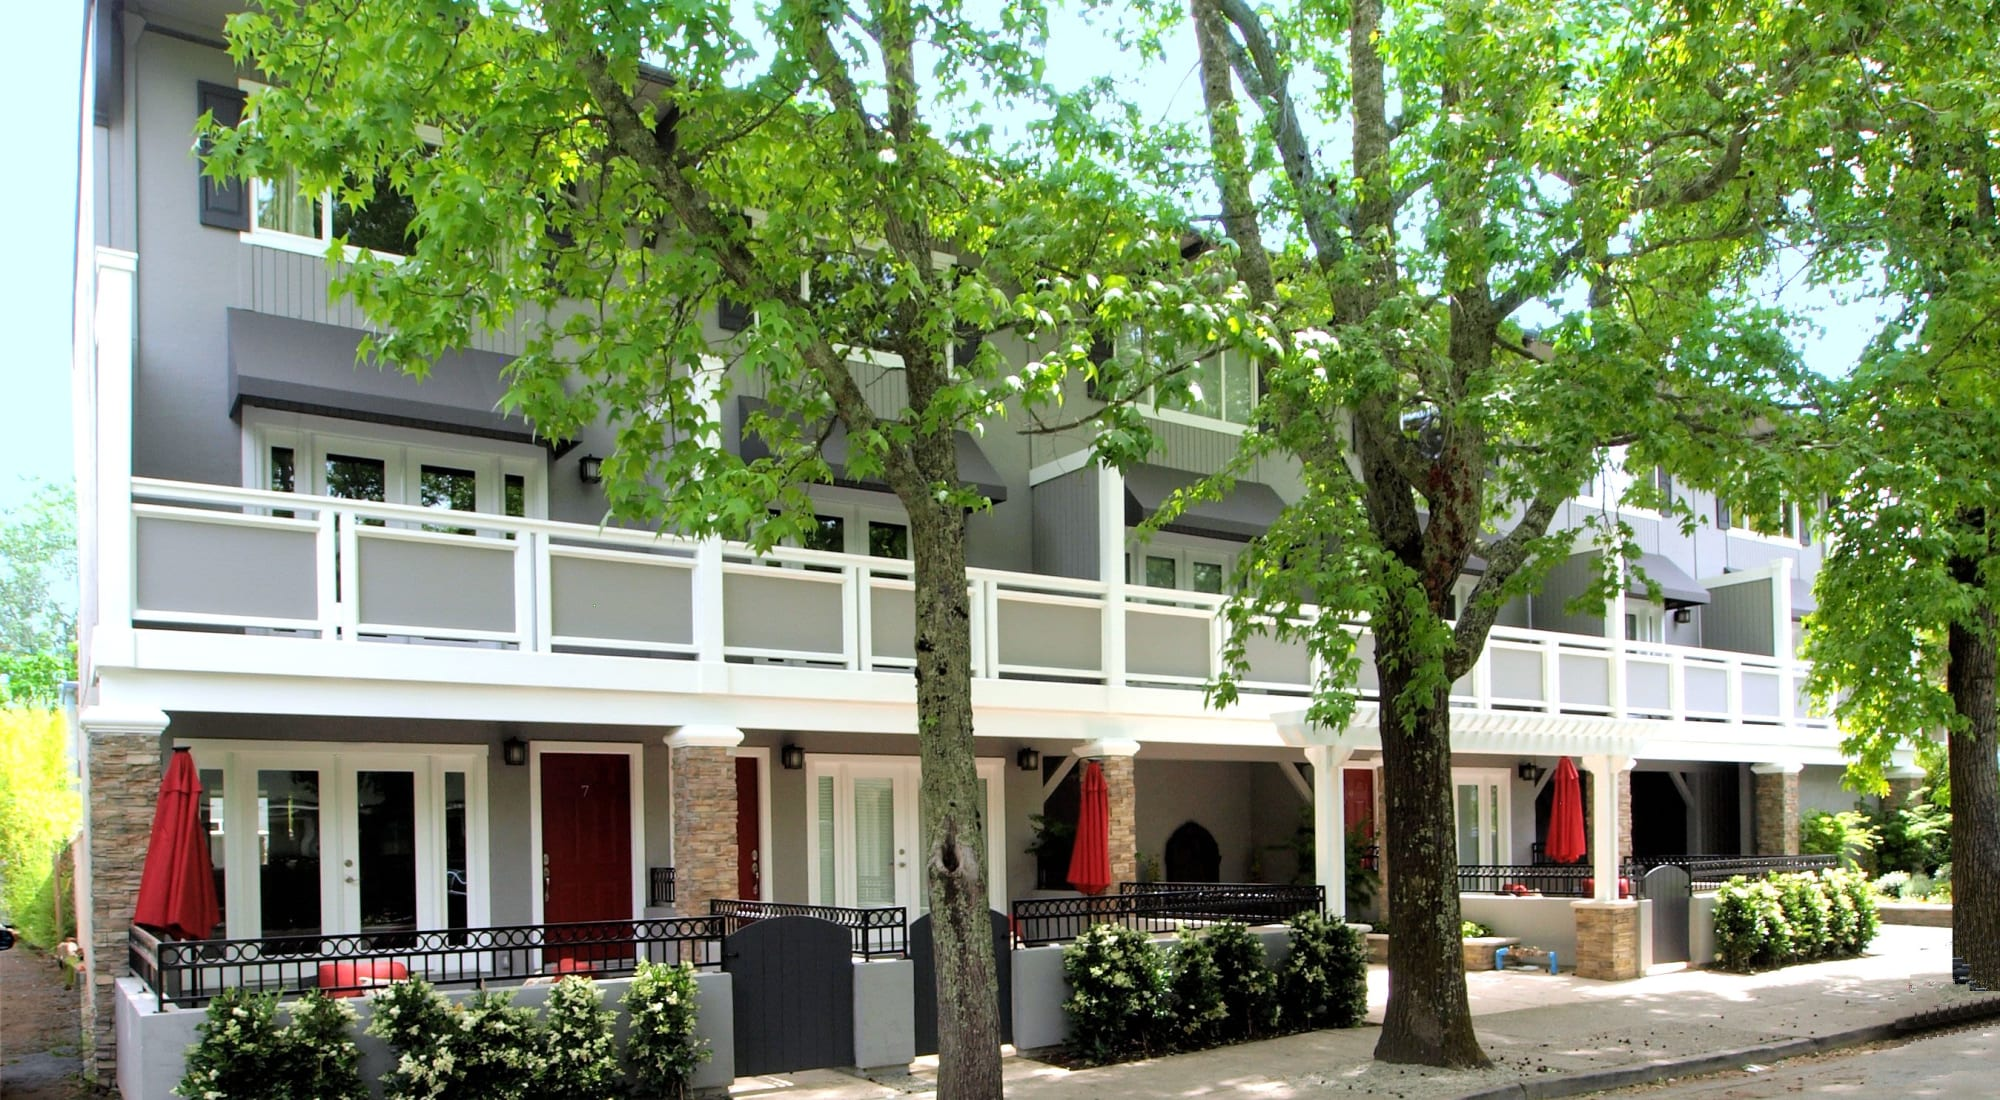 Apartments at 35 Tam in San Anselmo, California